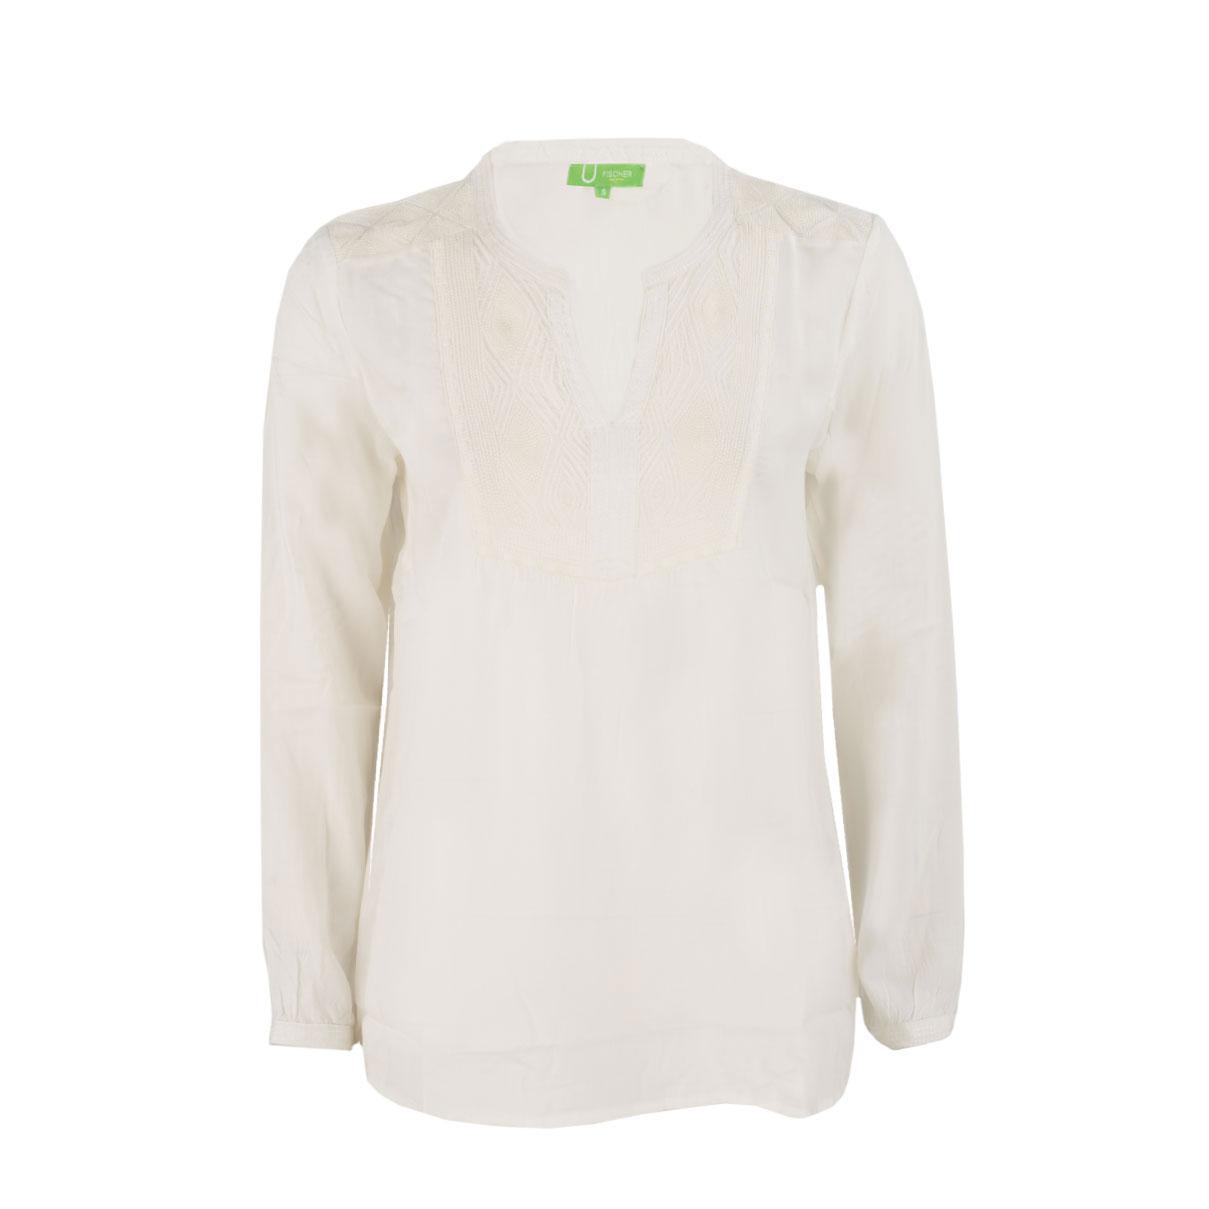 Bluse - Regular Fit - Stitching